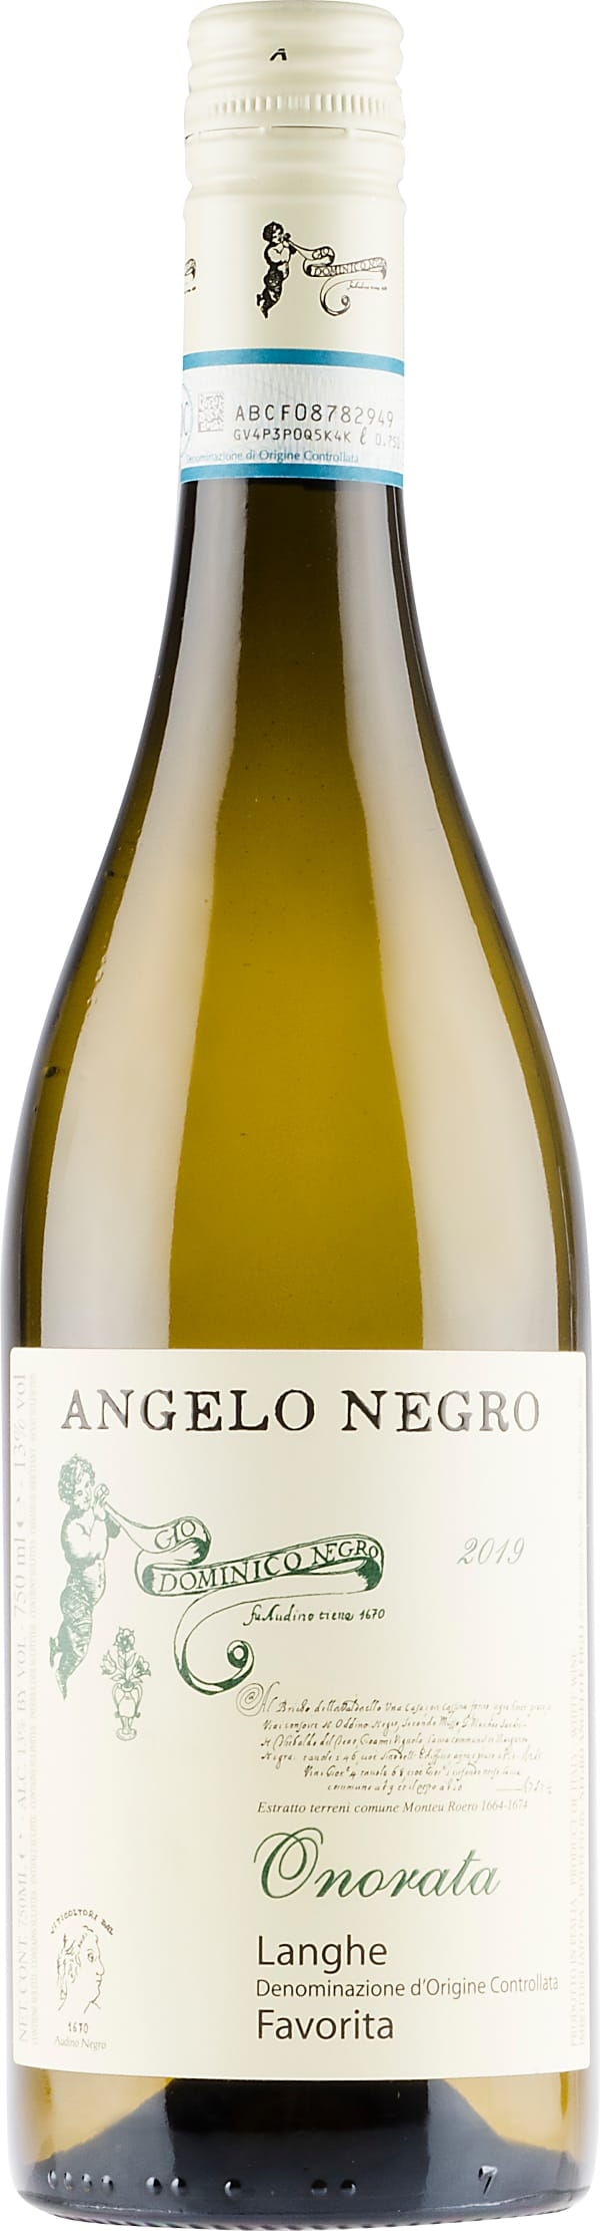 Angelo Negro Onorata Favorita 2020